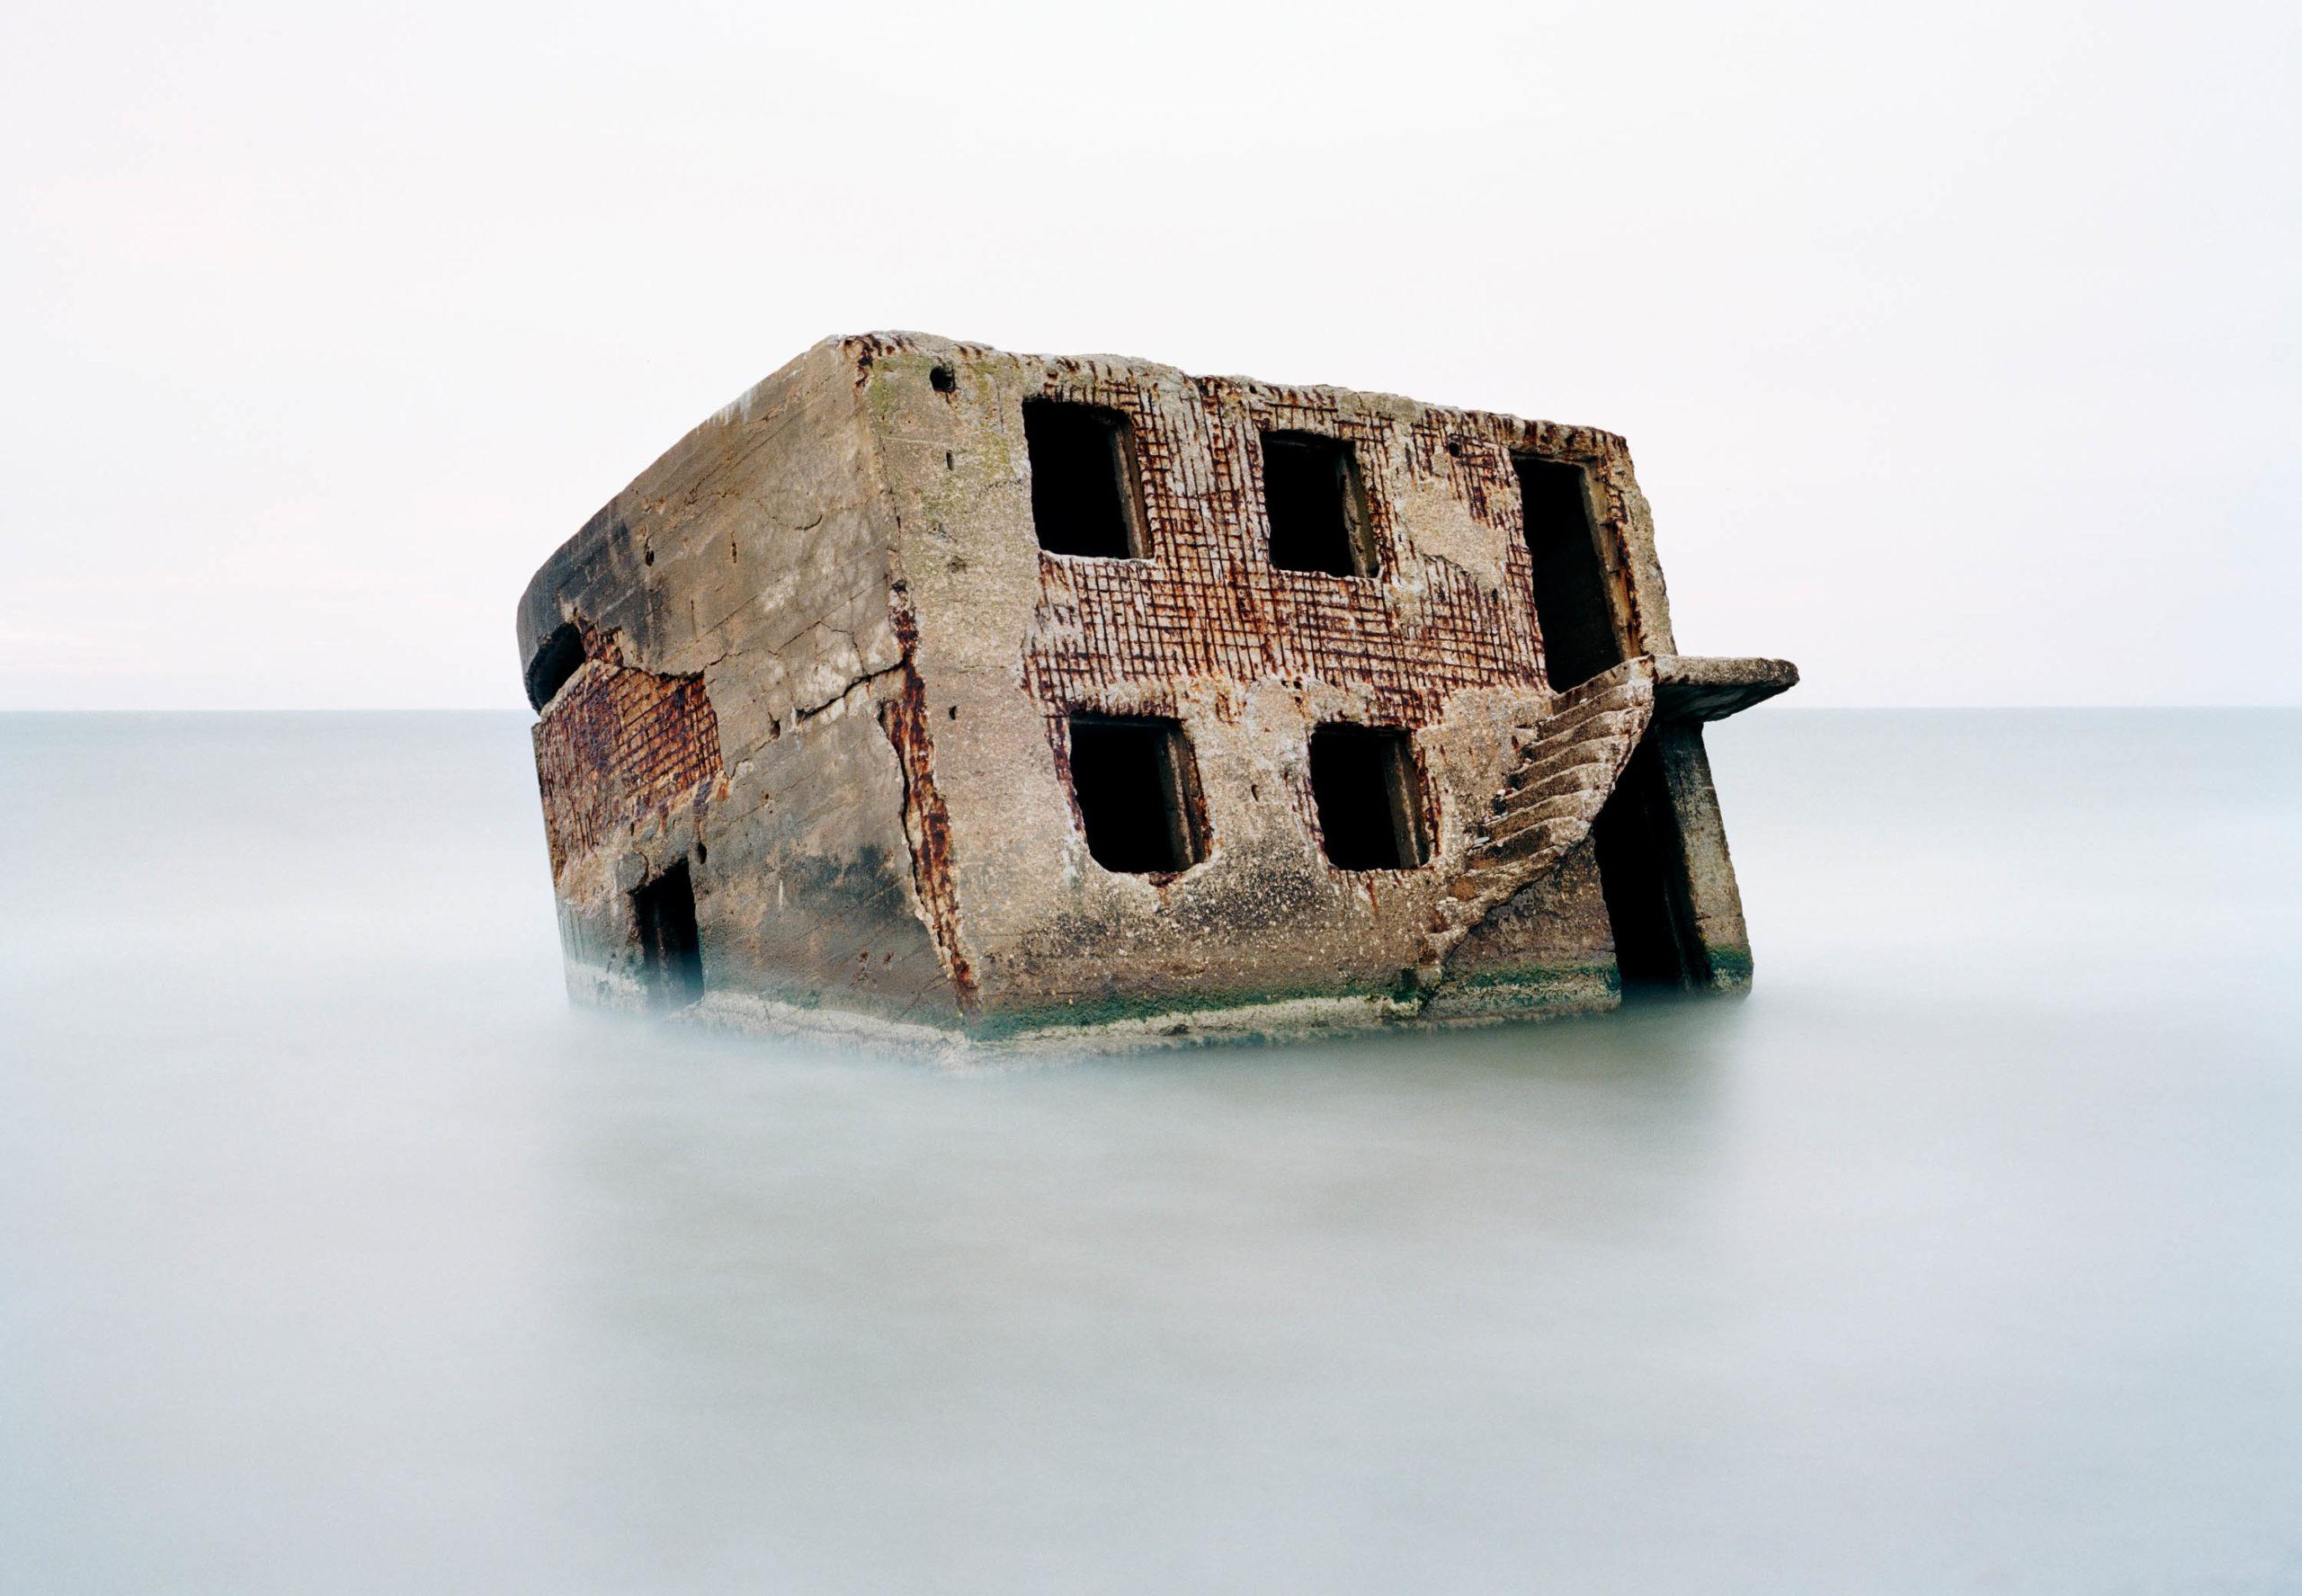 Latvia. Bunker in the Baltic Sea